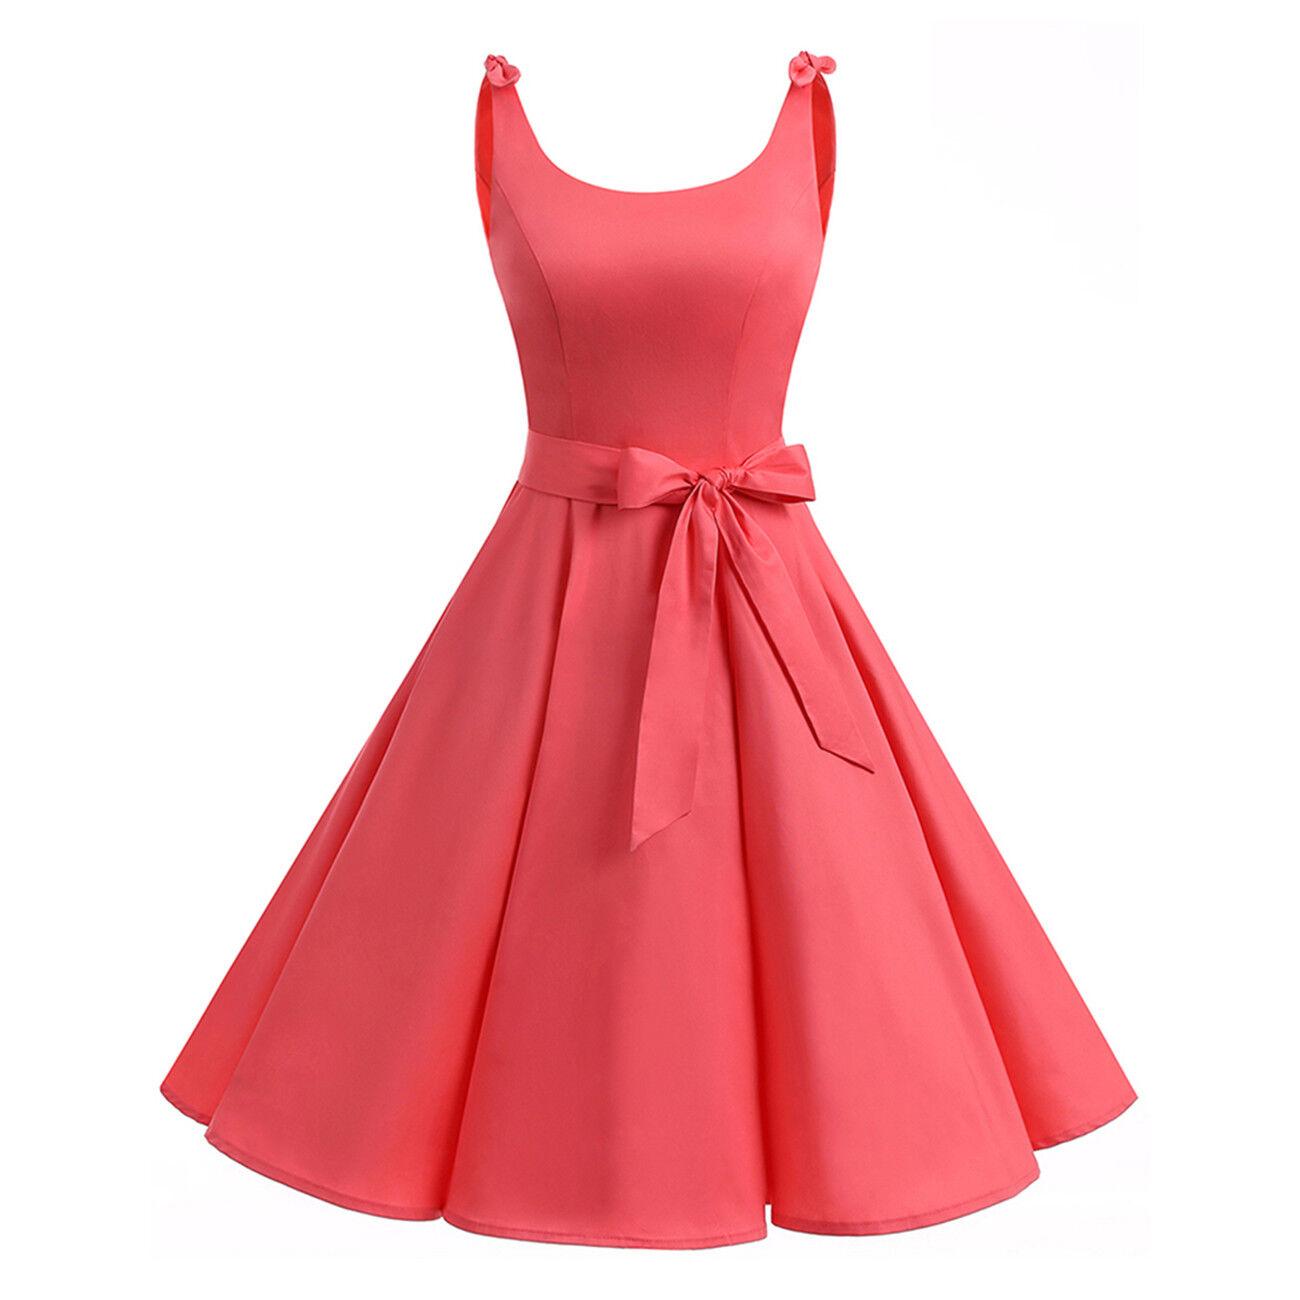 Women 50s Audrey Hepburn Style Vintage Dress Sleeveless Chic